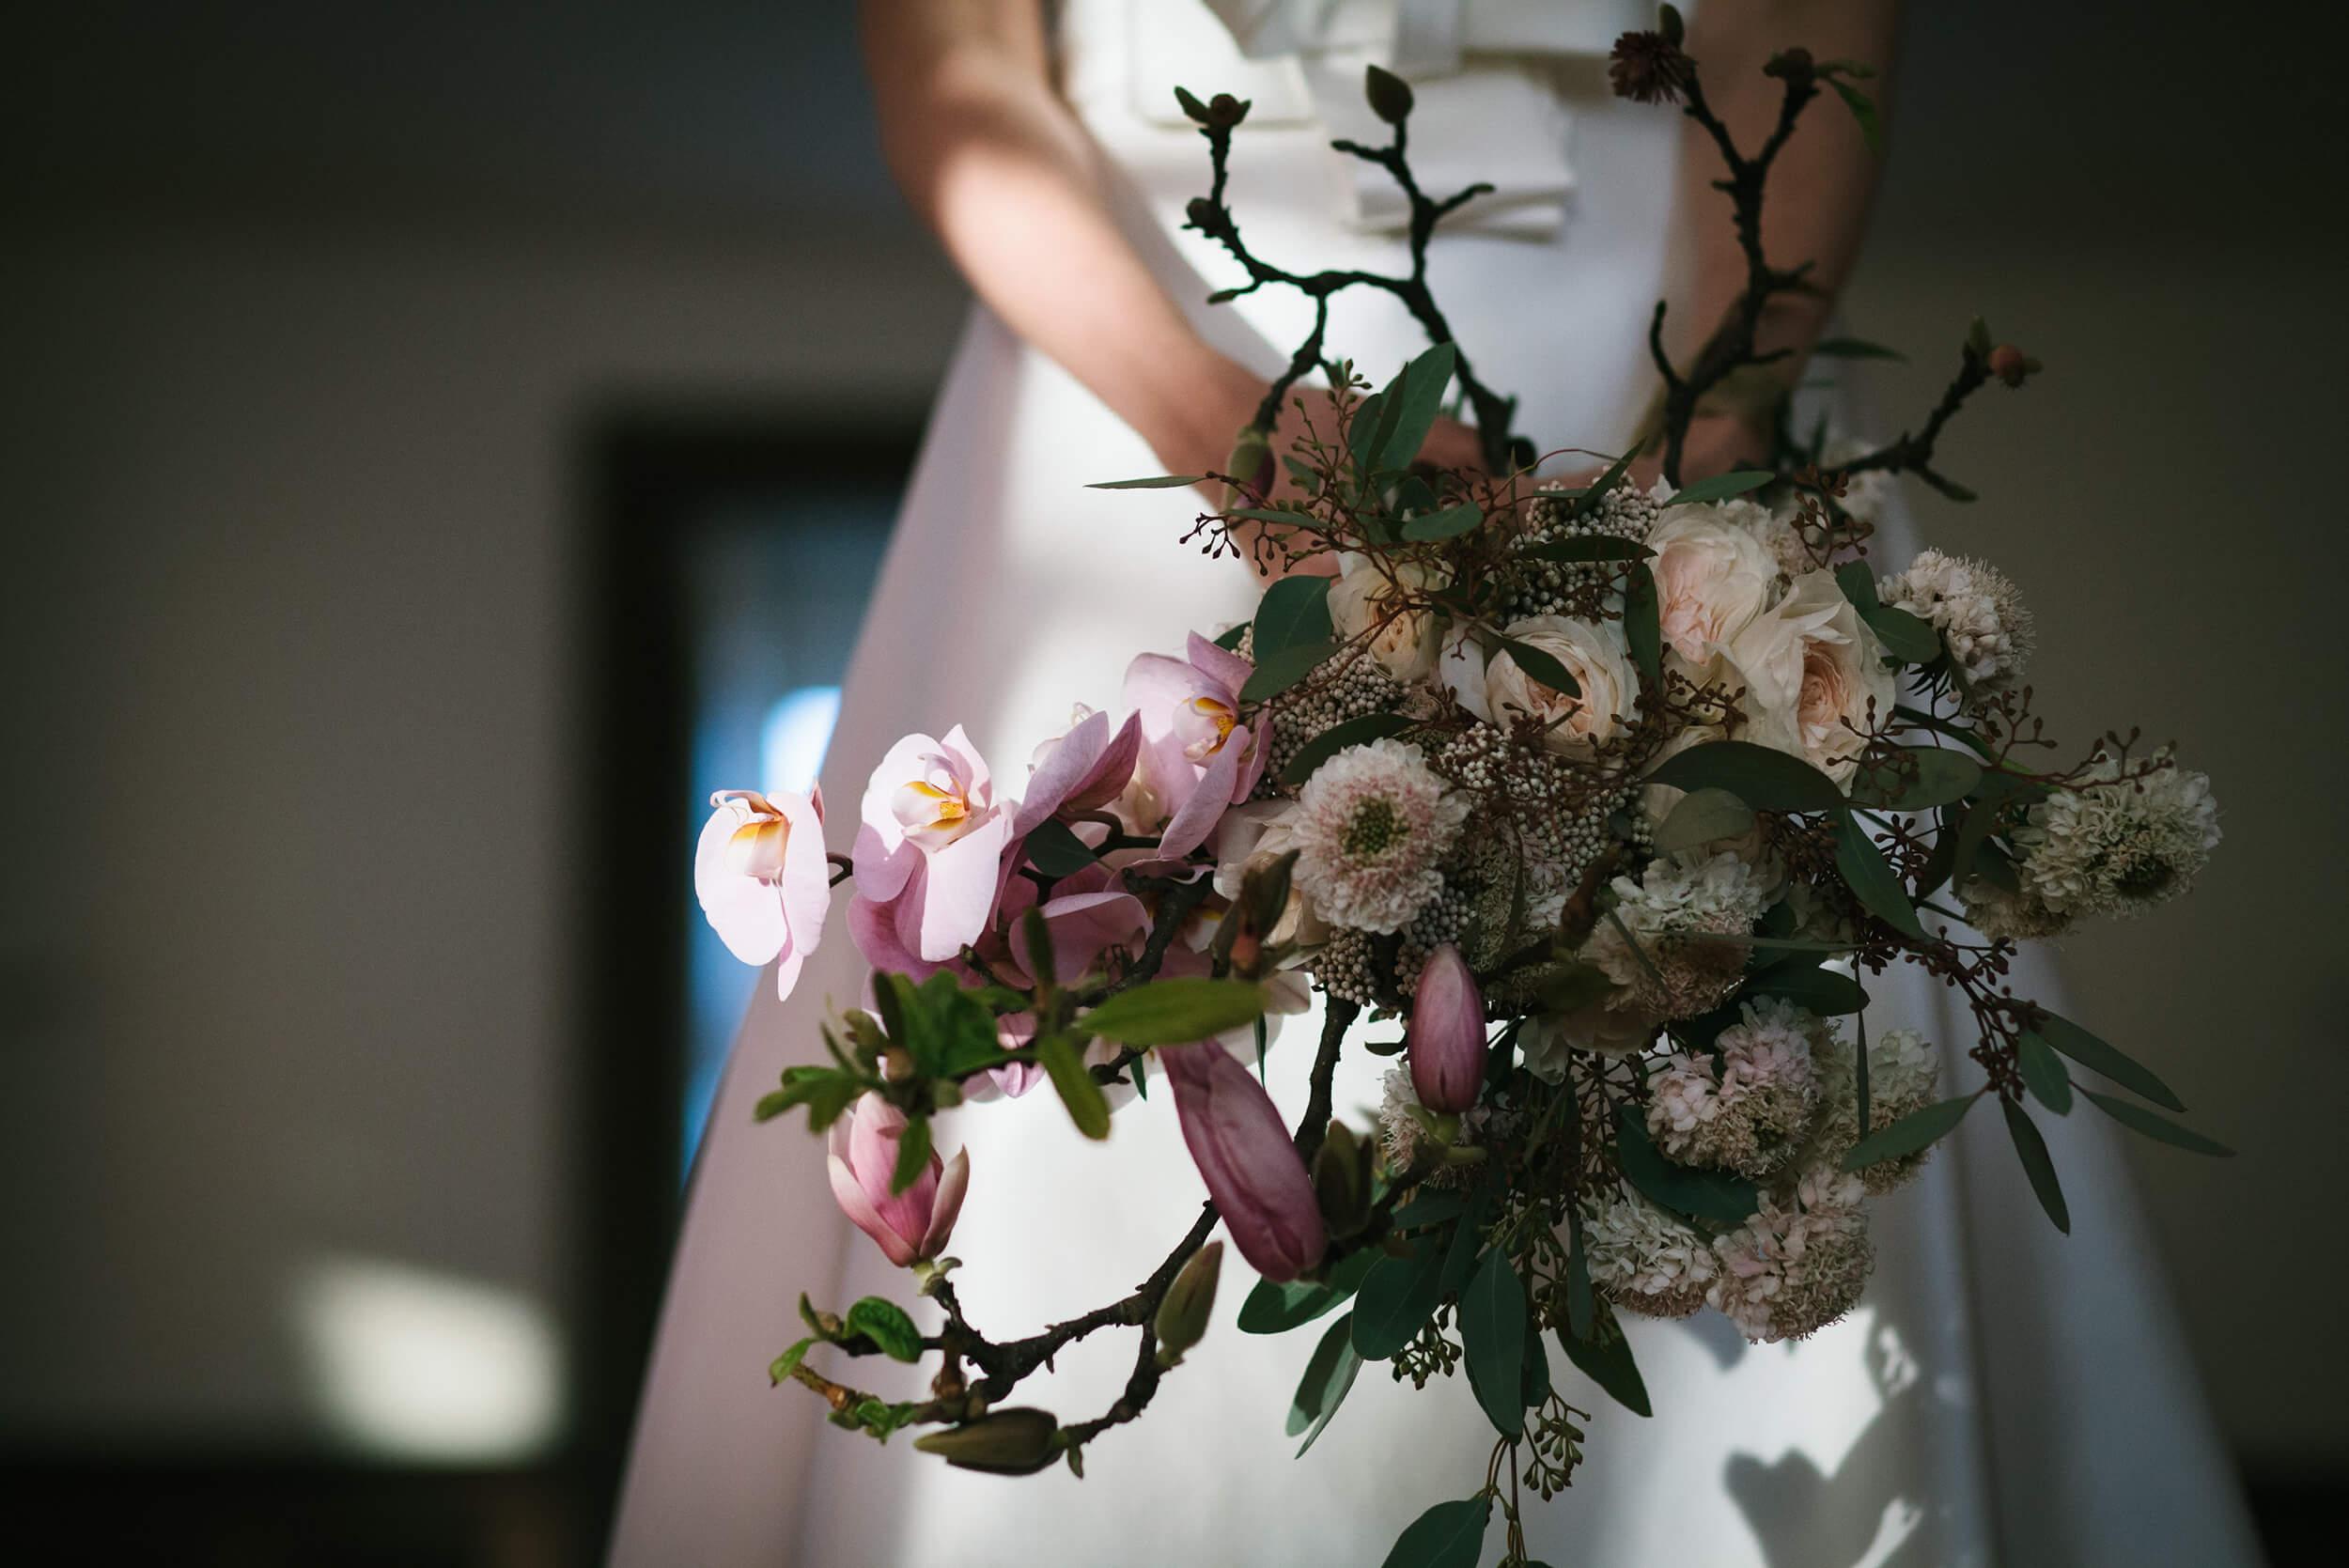 roma-organizacao-eventos-editorial-jardin-d'epoque-design-floral-46